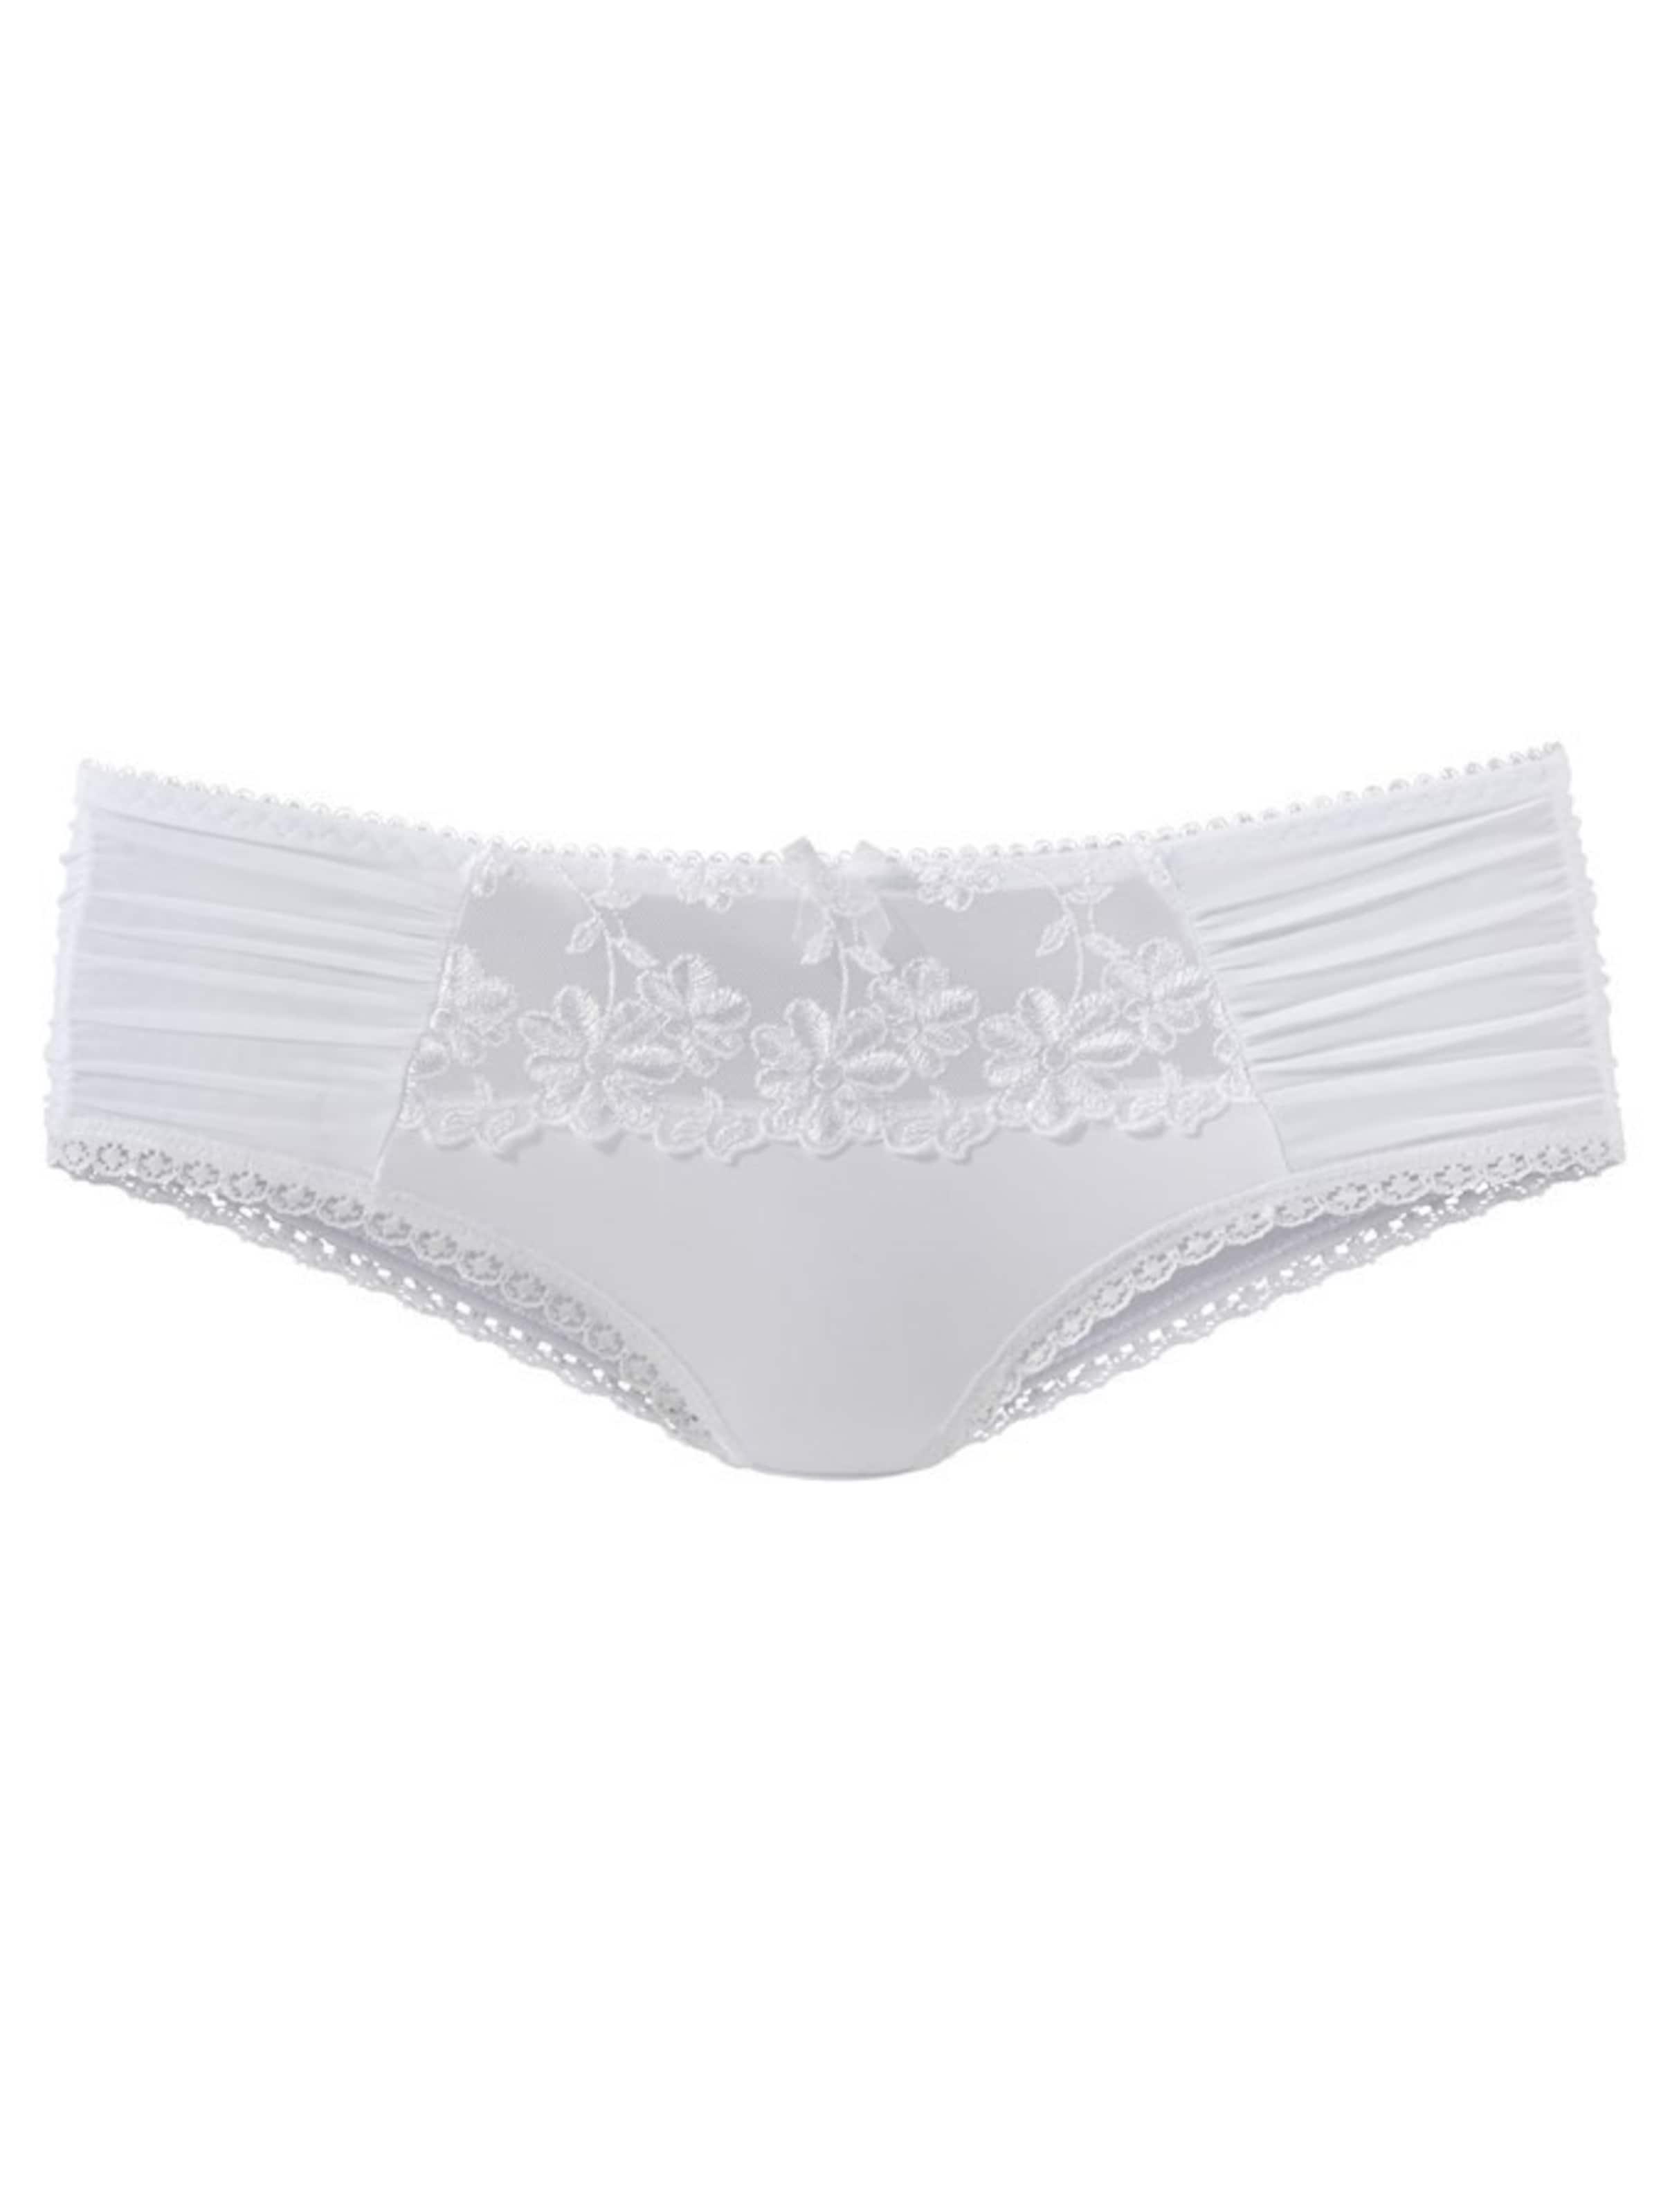 In Weiß Nuance Panty In Weiß Panty In Panty Nuance Nuance fY7bgmvI6y